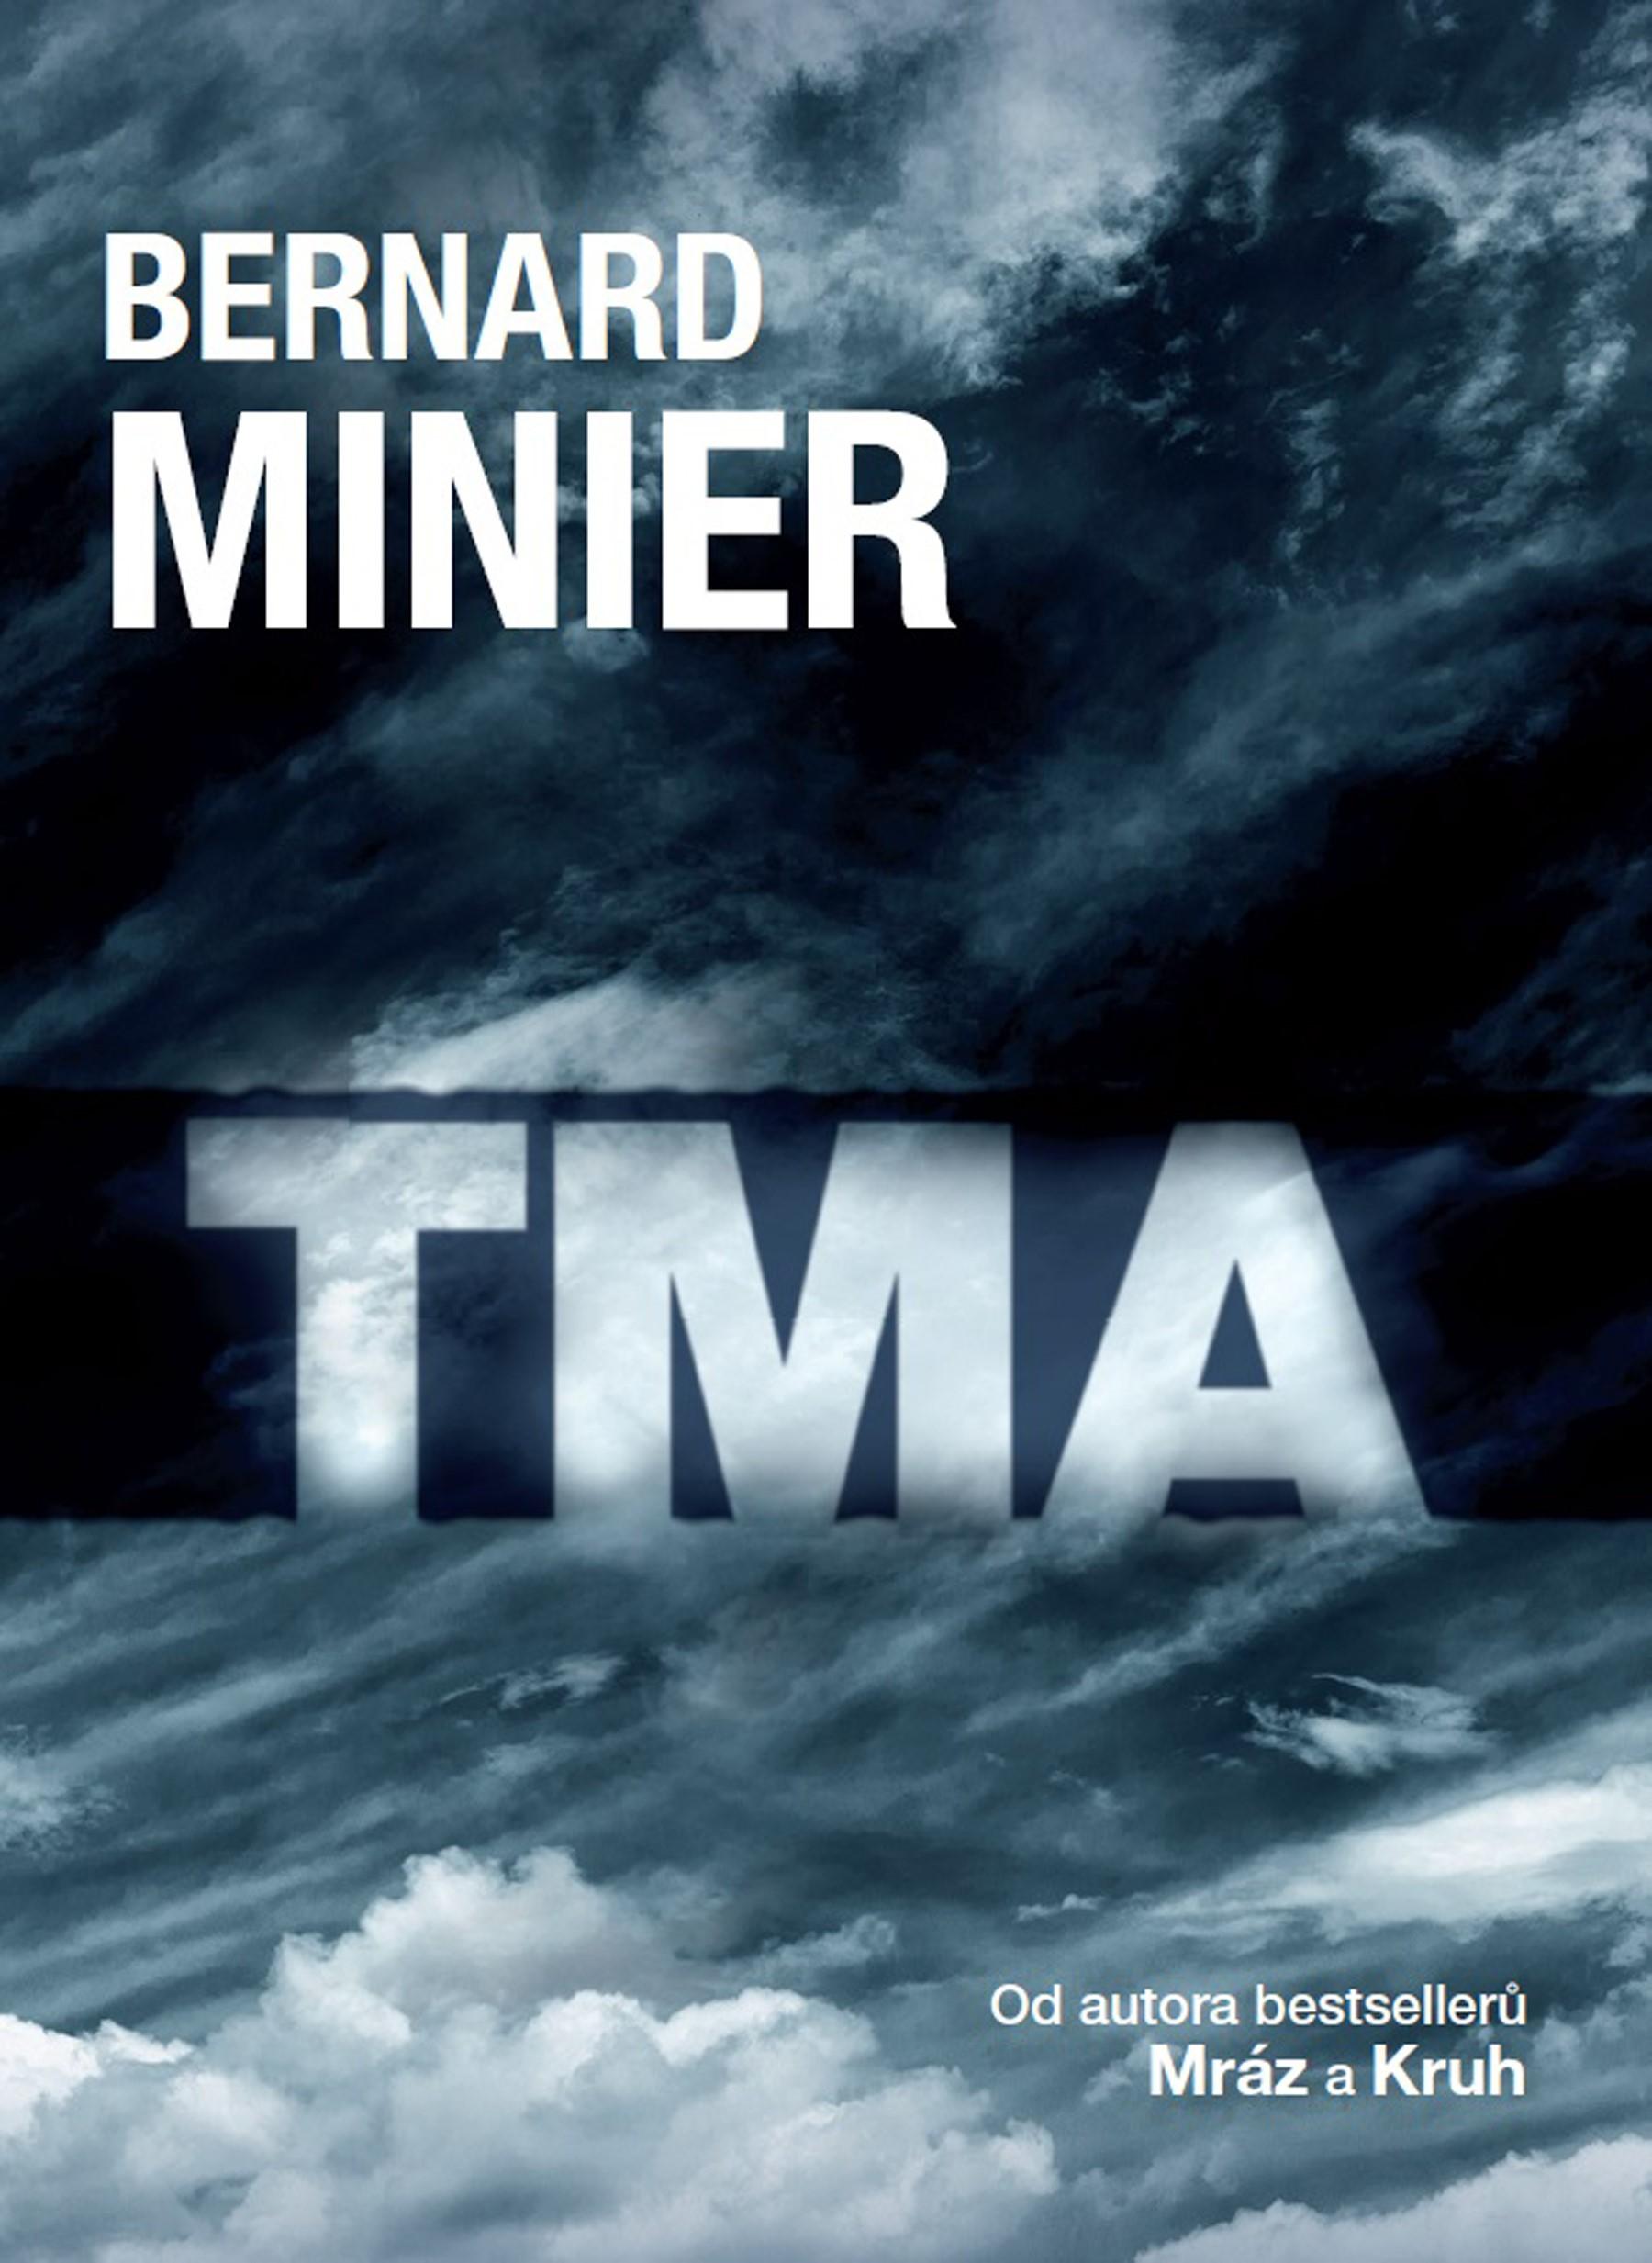 Tma | Bernard Minier